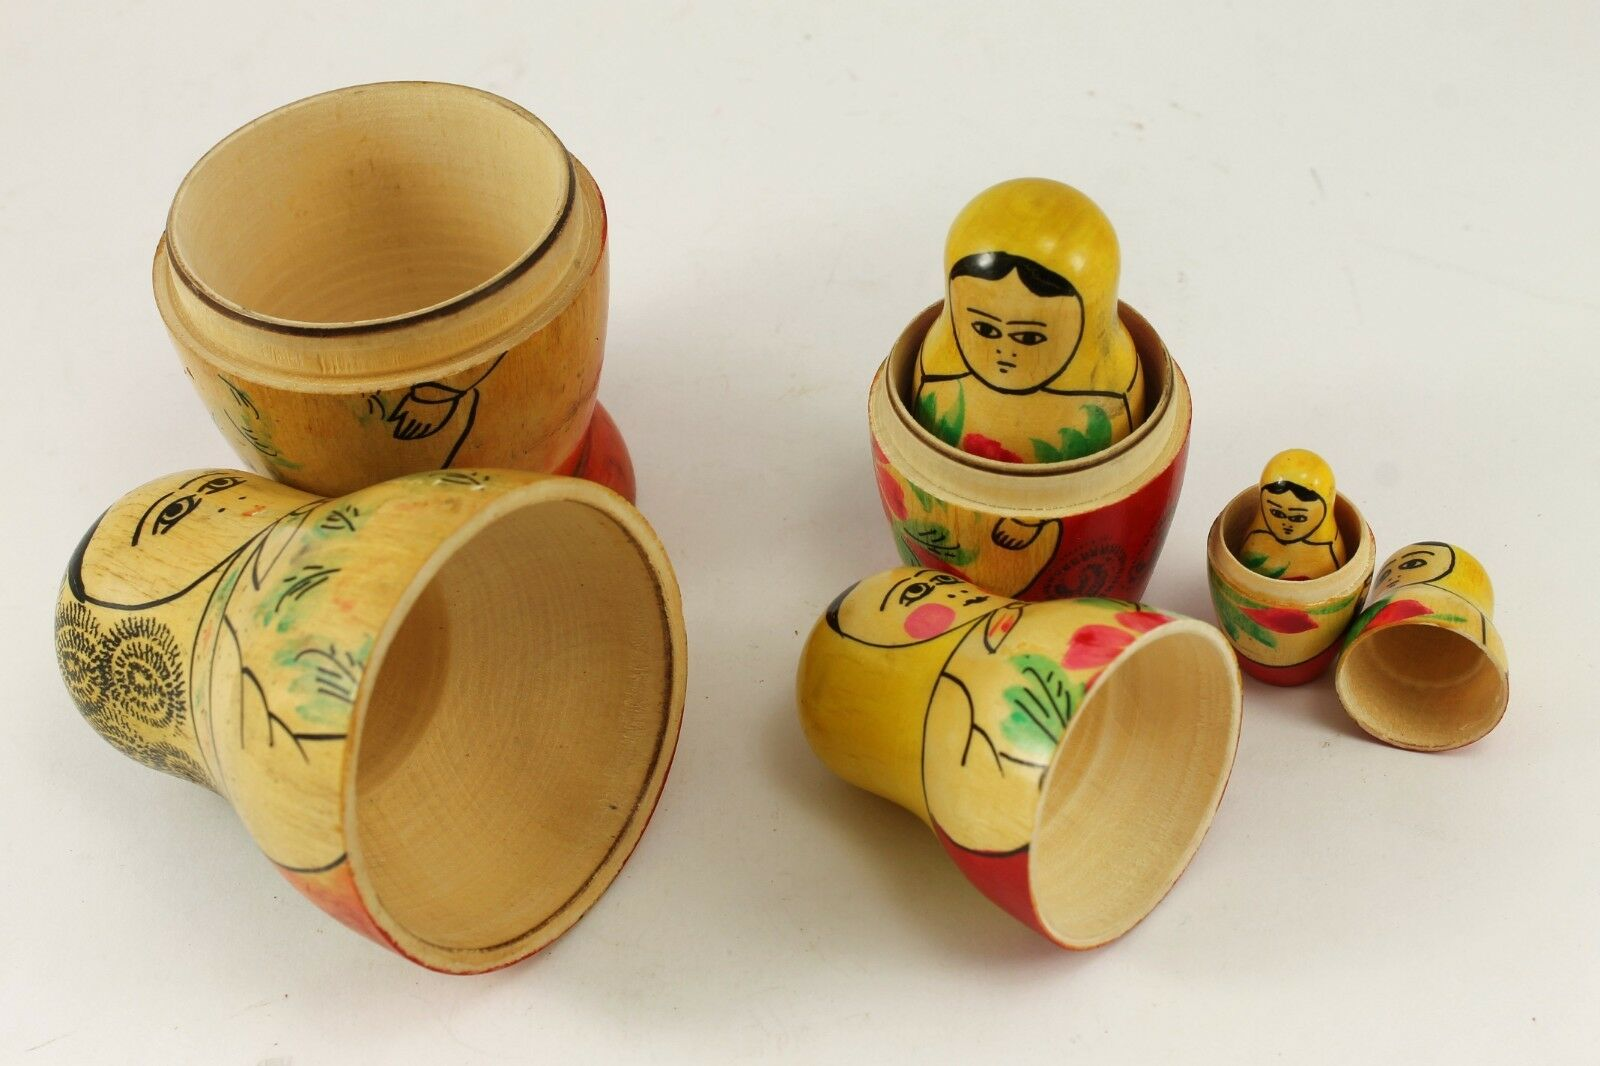 1965 Vintage Vintage Vintage Russian Wooden Dolls Set MATRYOSHKA Hand Painted 70da48